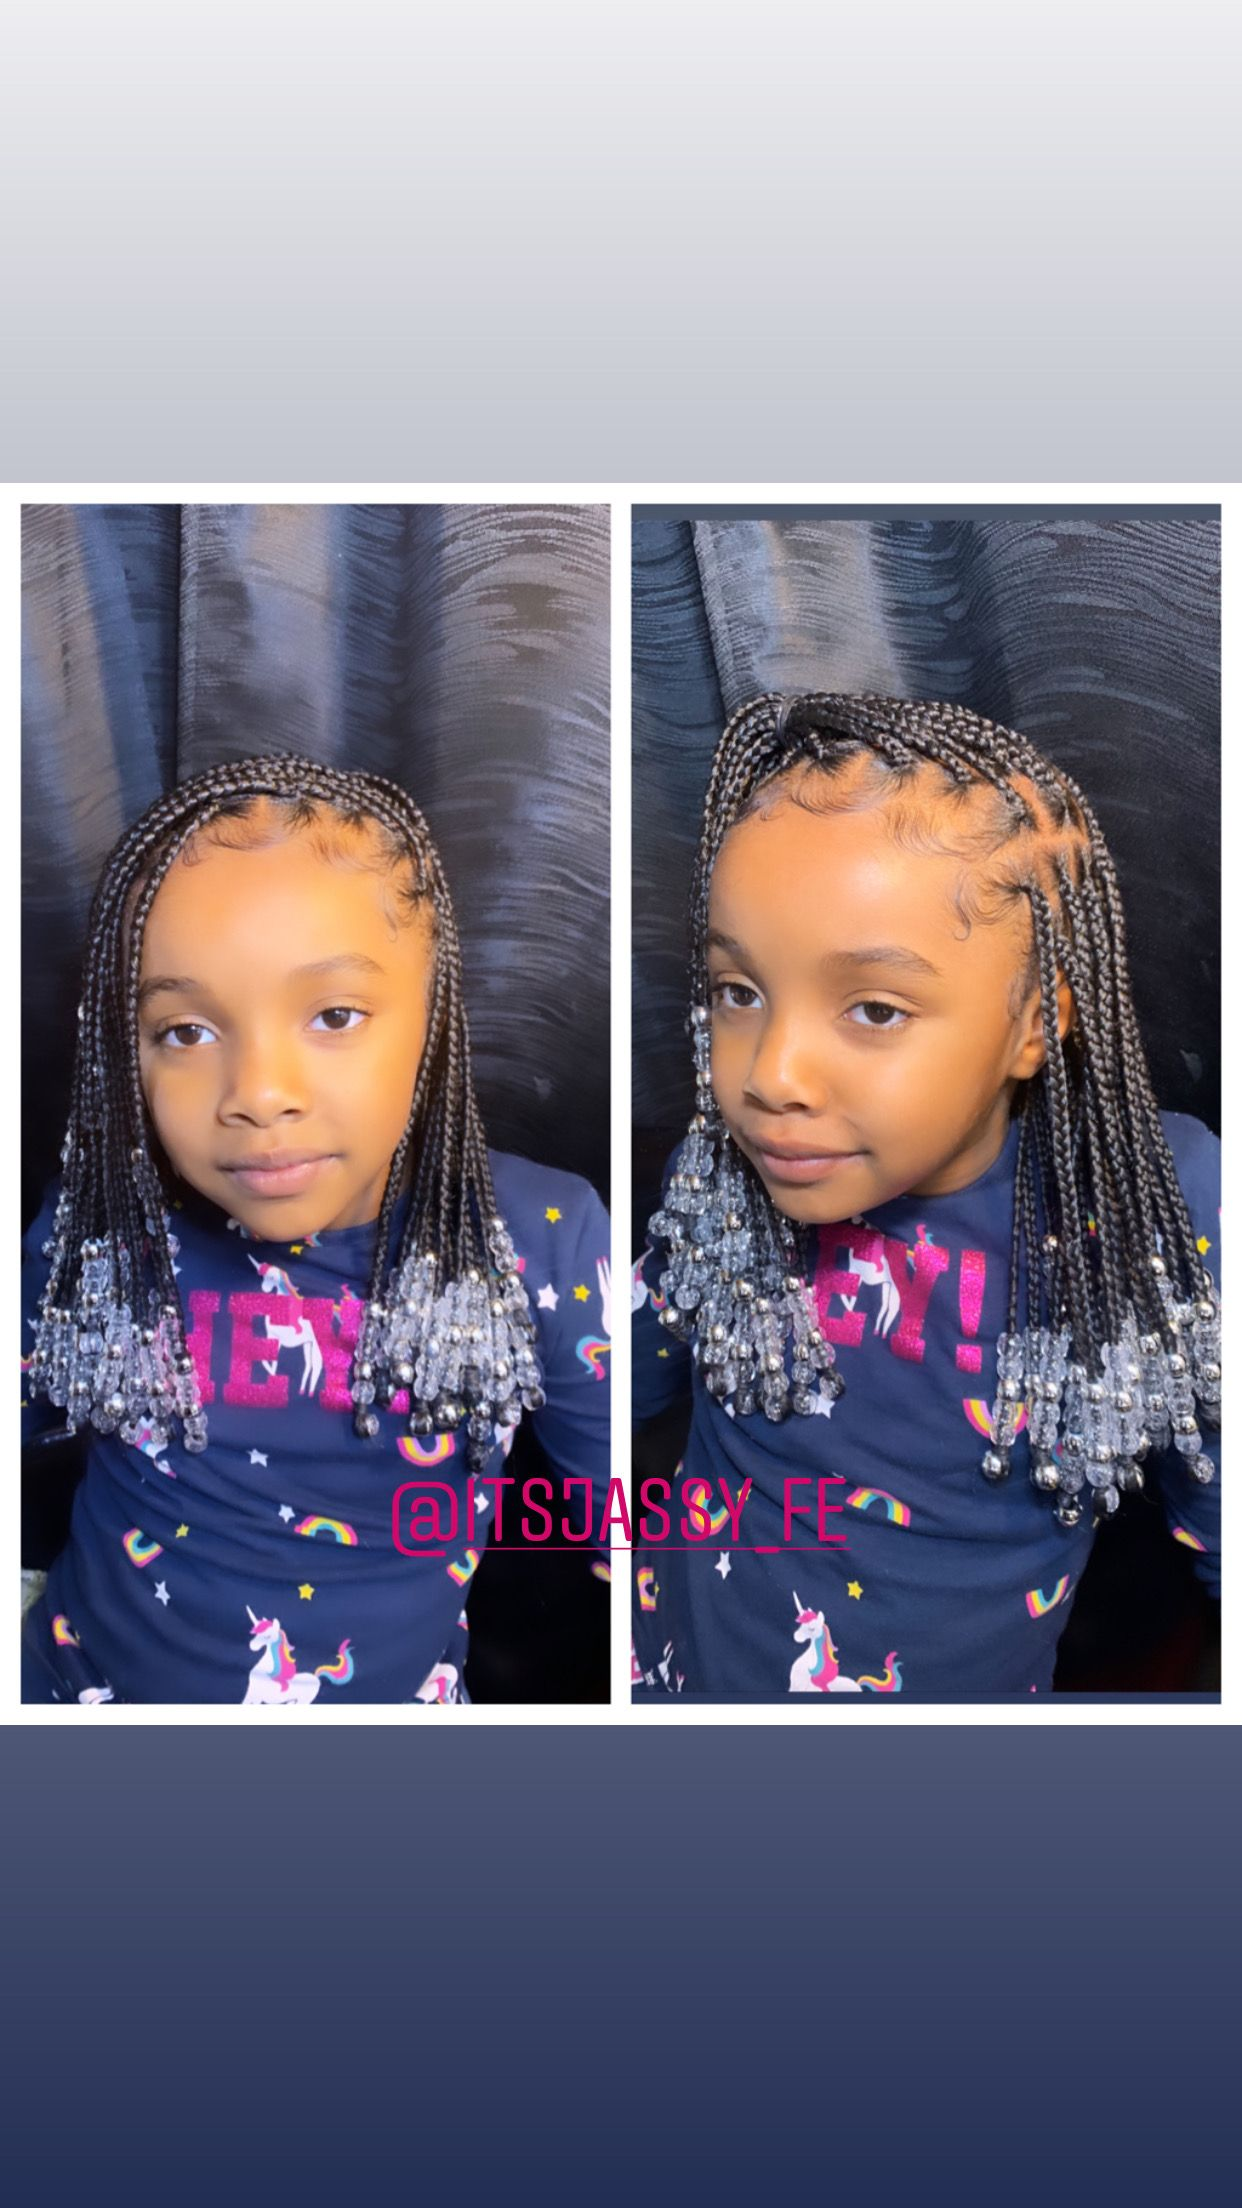 Kids Knotless Braids With Beads Kids Braids With Beads Cute Toddler Hairstyles Toddler Hairstyles Girl